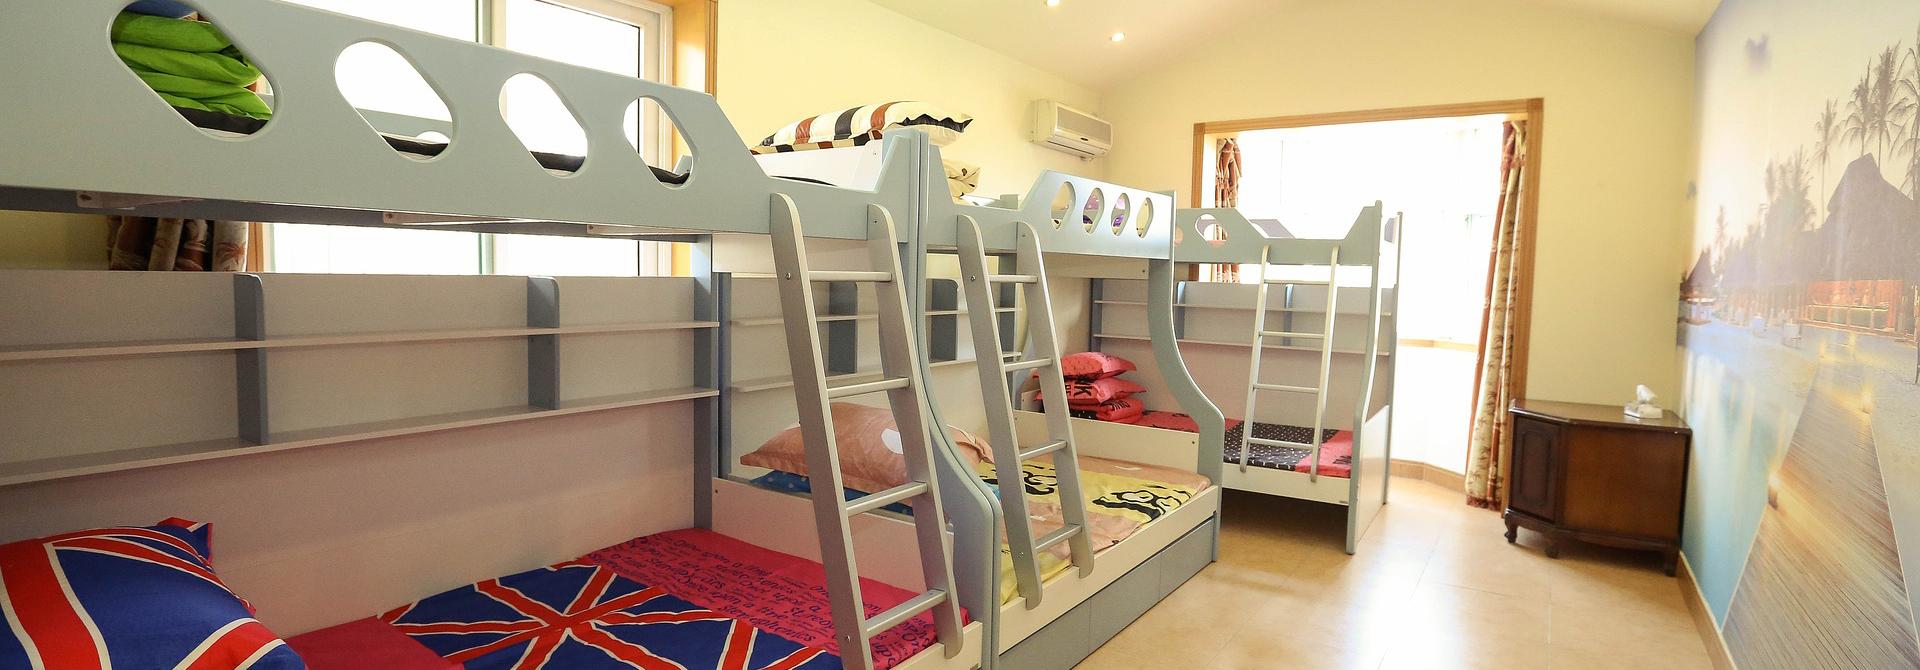 Group hero banner bunk beds